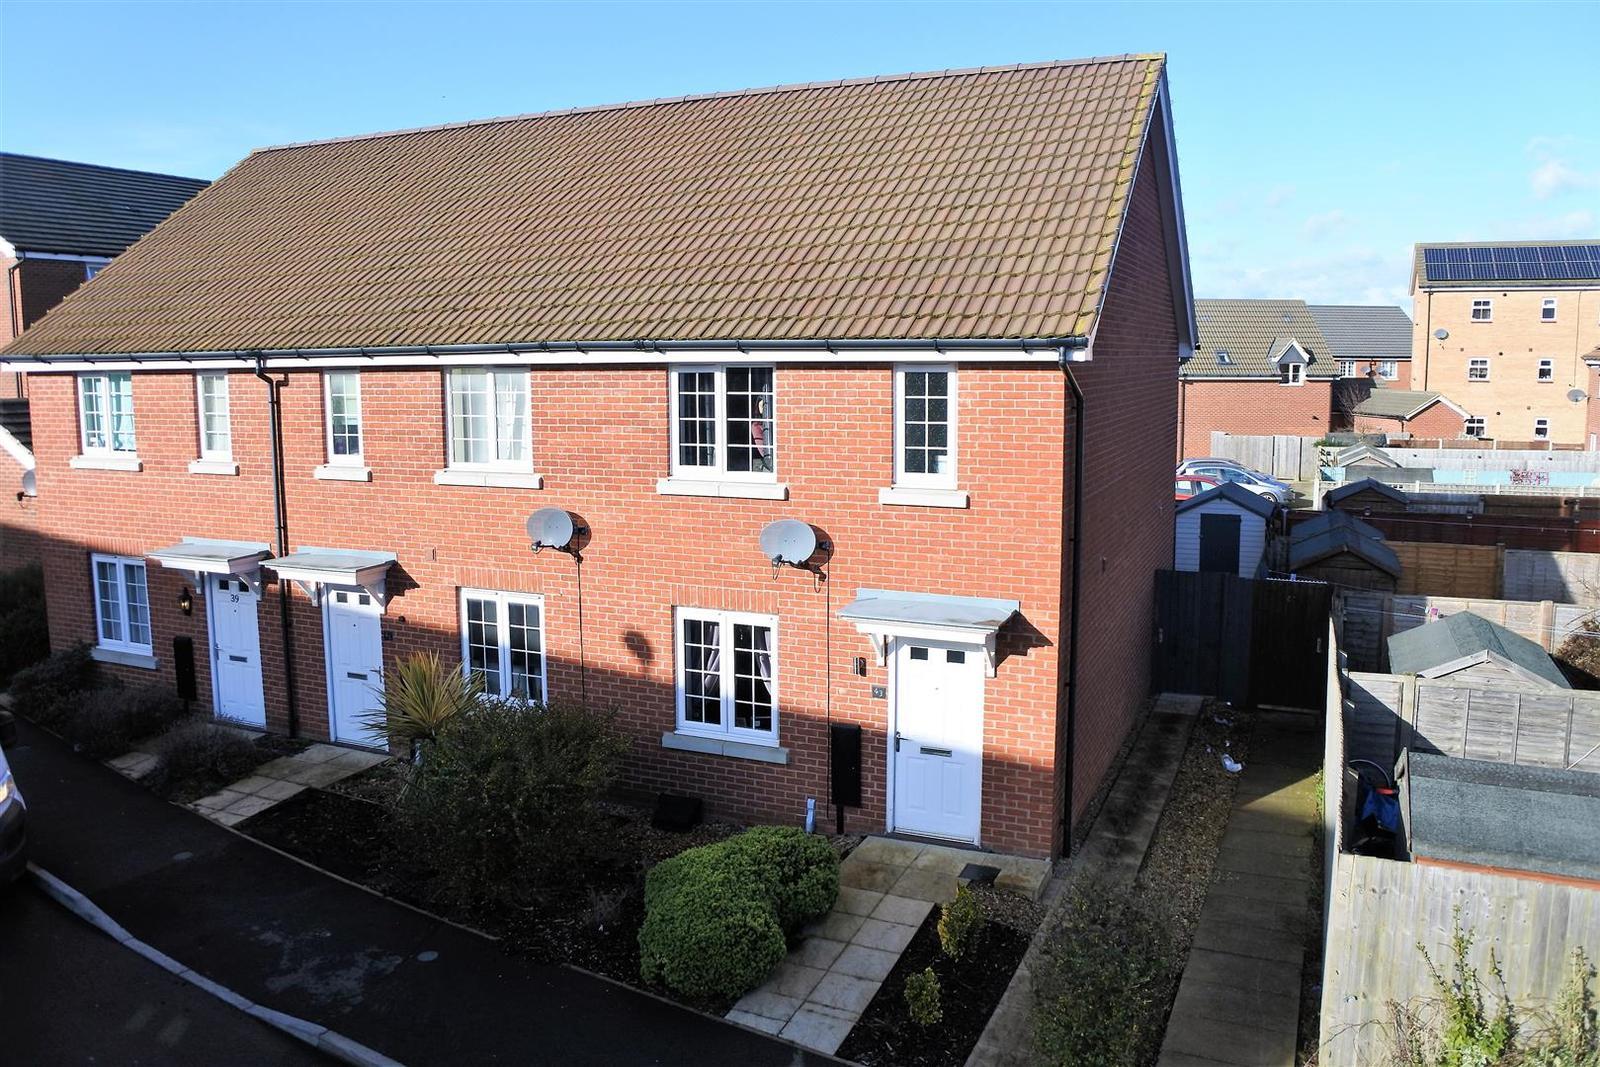 3 Bedrooms Property for sale in Wilks Road, Grantham